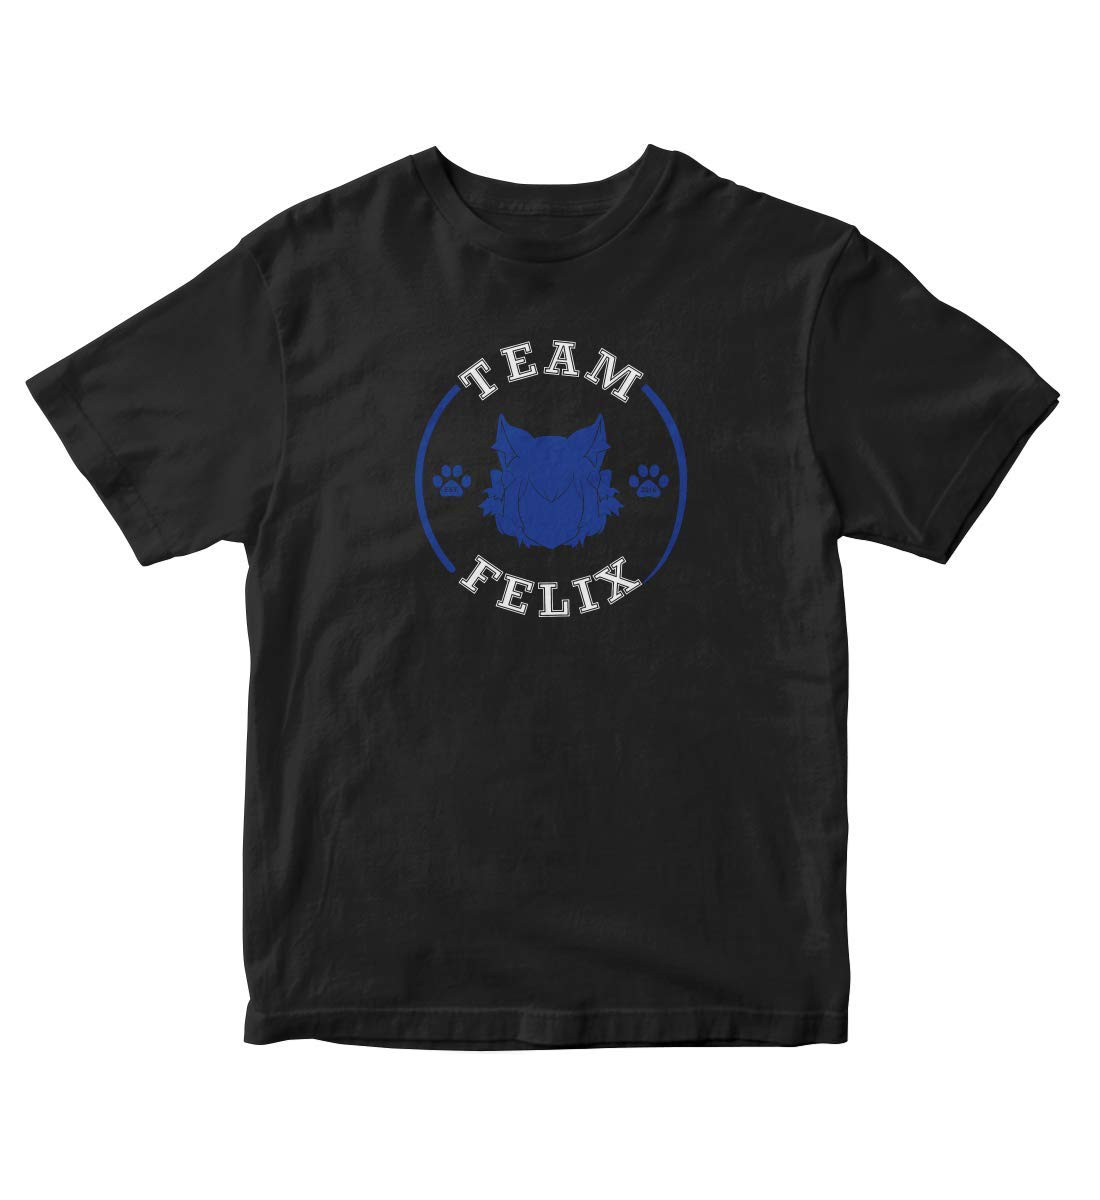 Team Felix Re Zero Manga Anime Black Shirt S 60